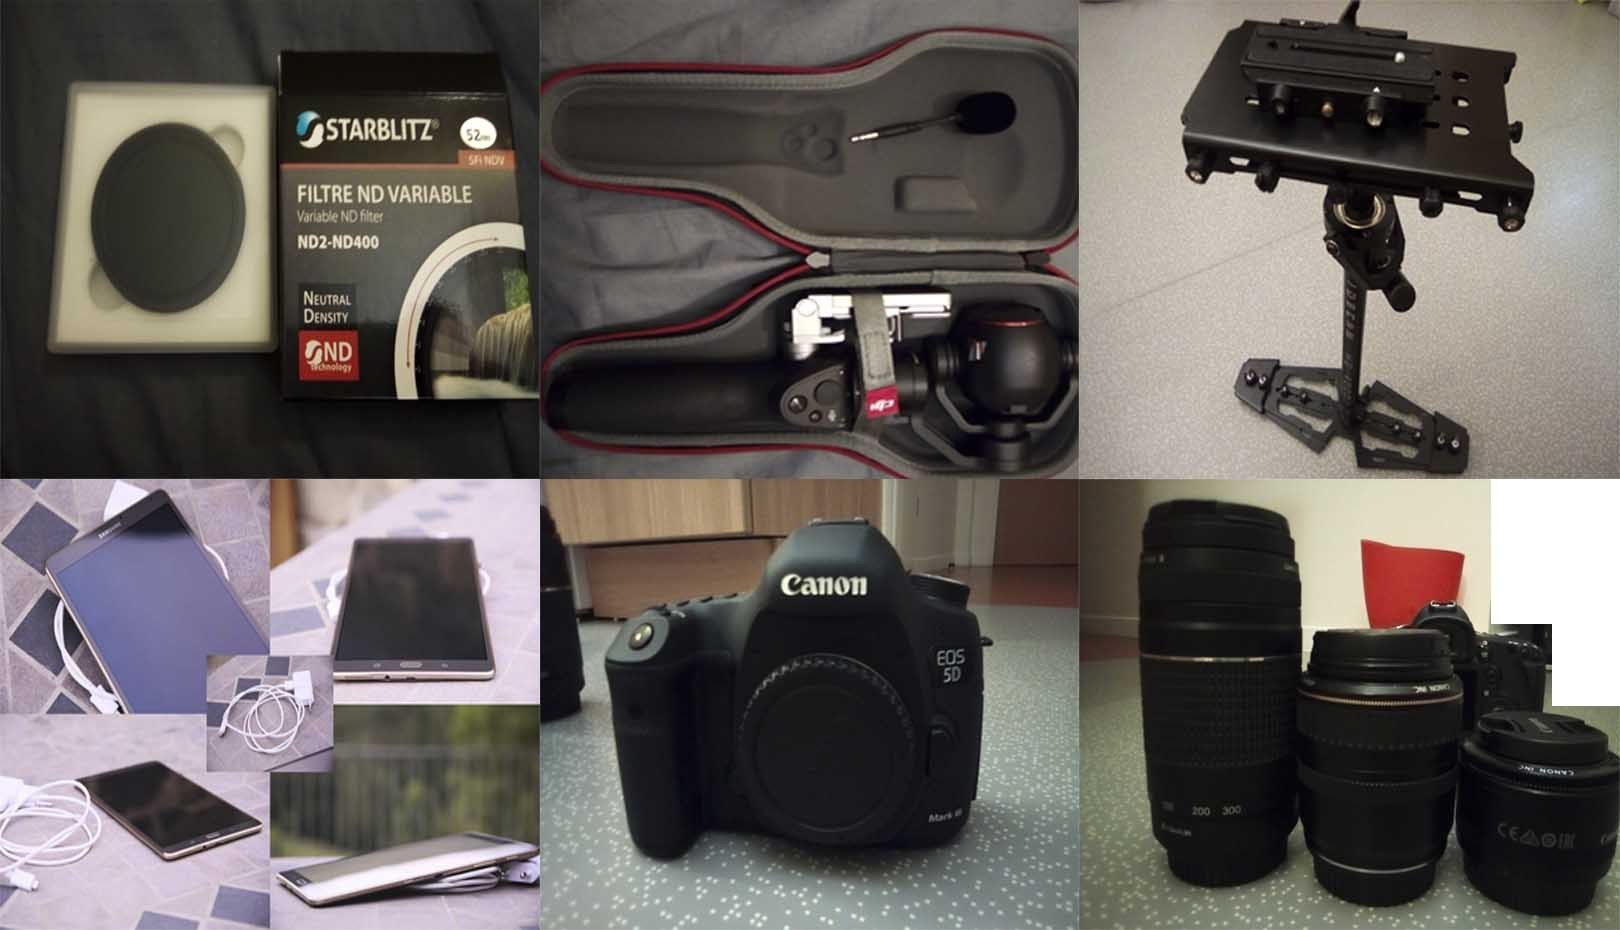 Kit 5D Mark III + Optiques, Accessoires + Dji Osmo +, Glidecam HD4000